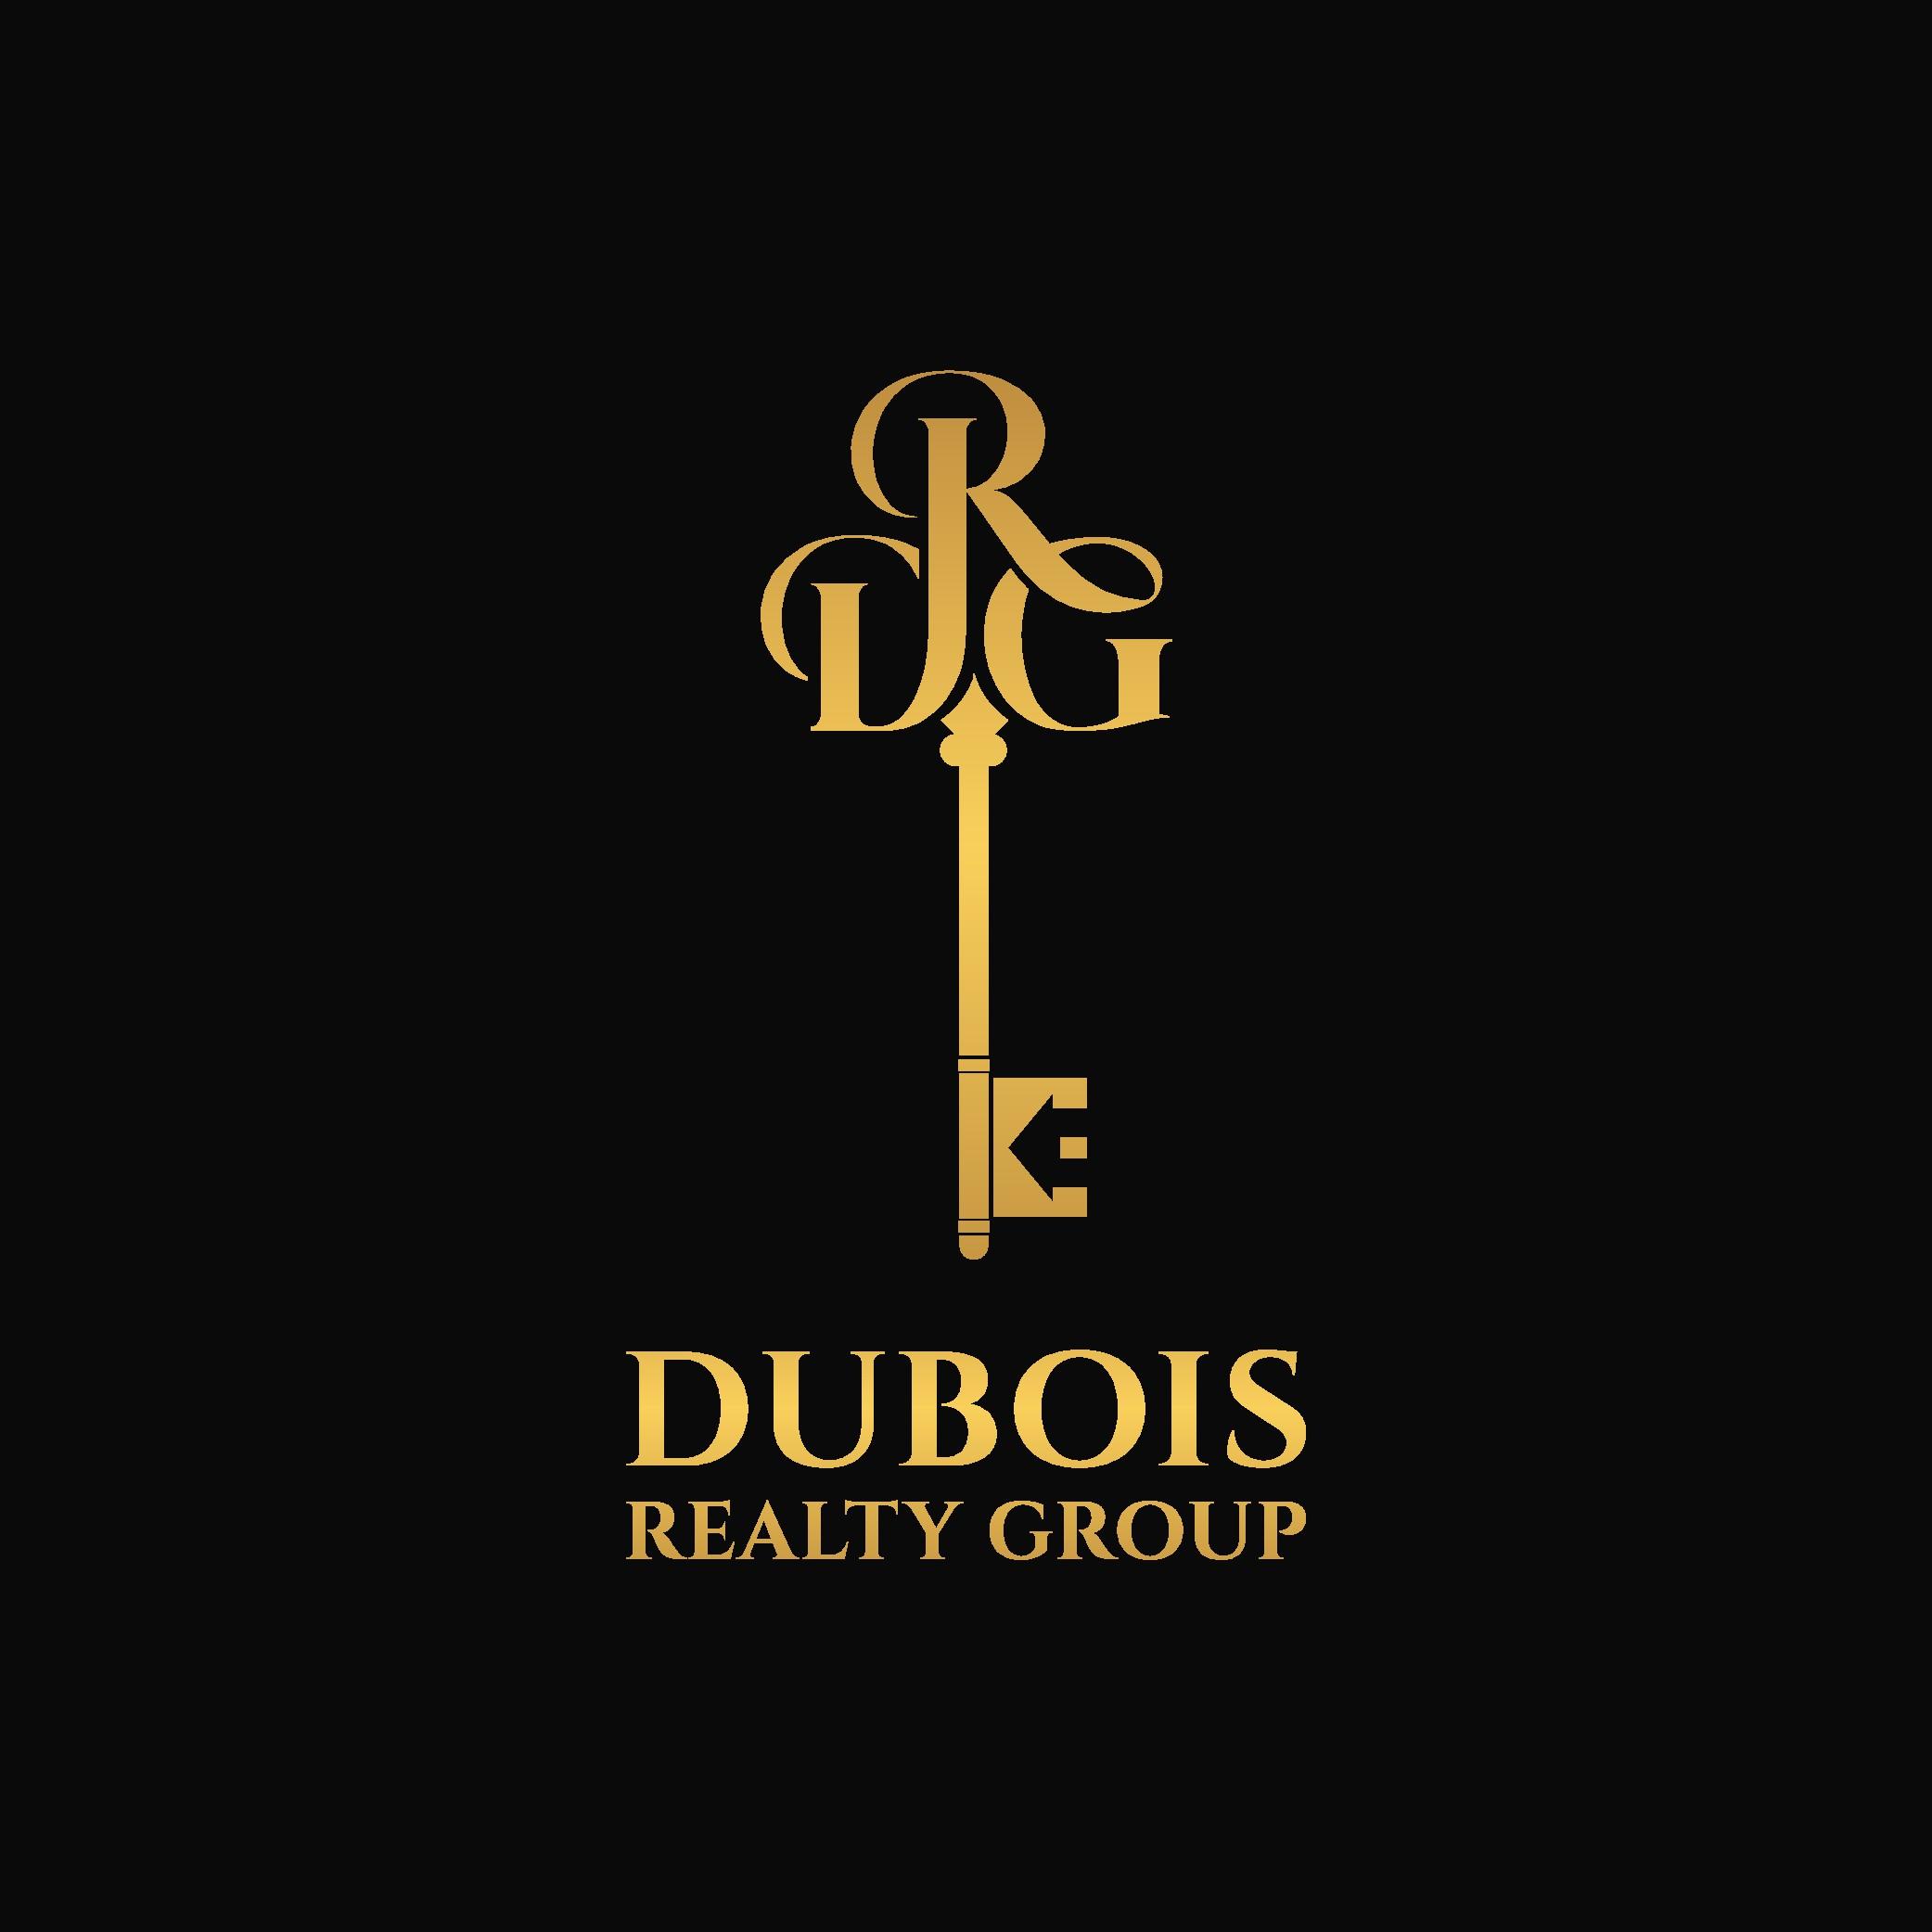 Luxury residential Real Estate team needs a logo design